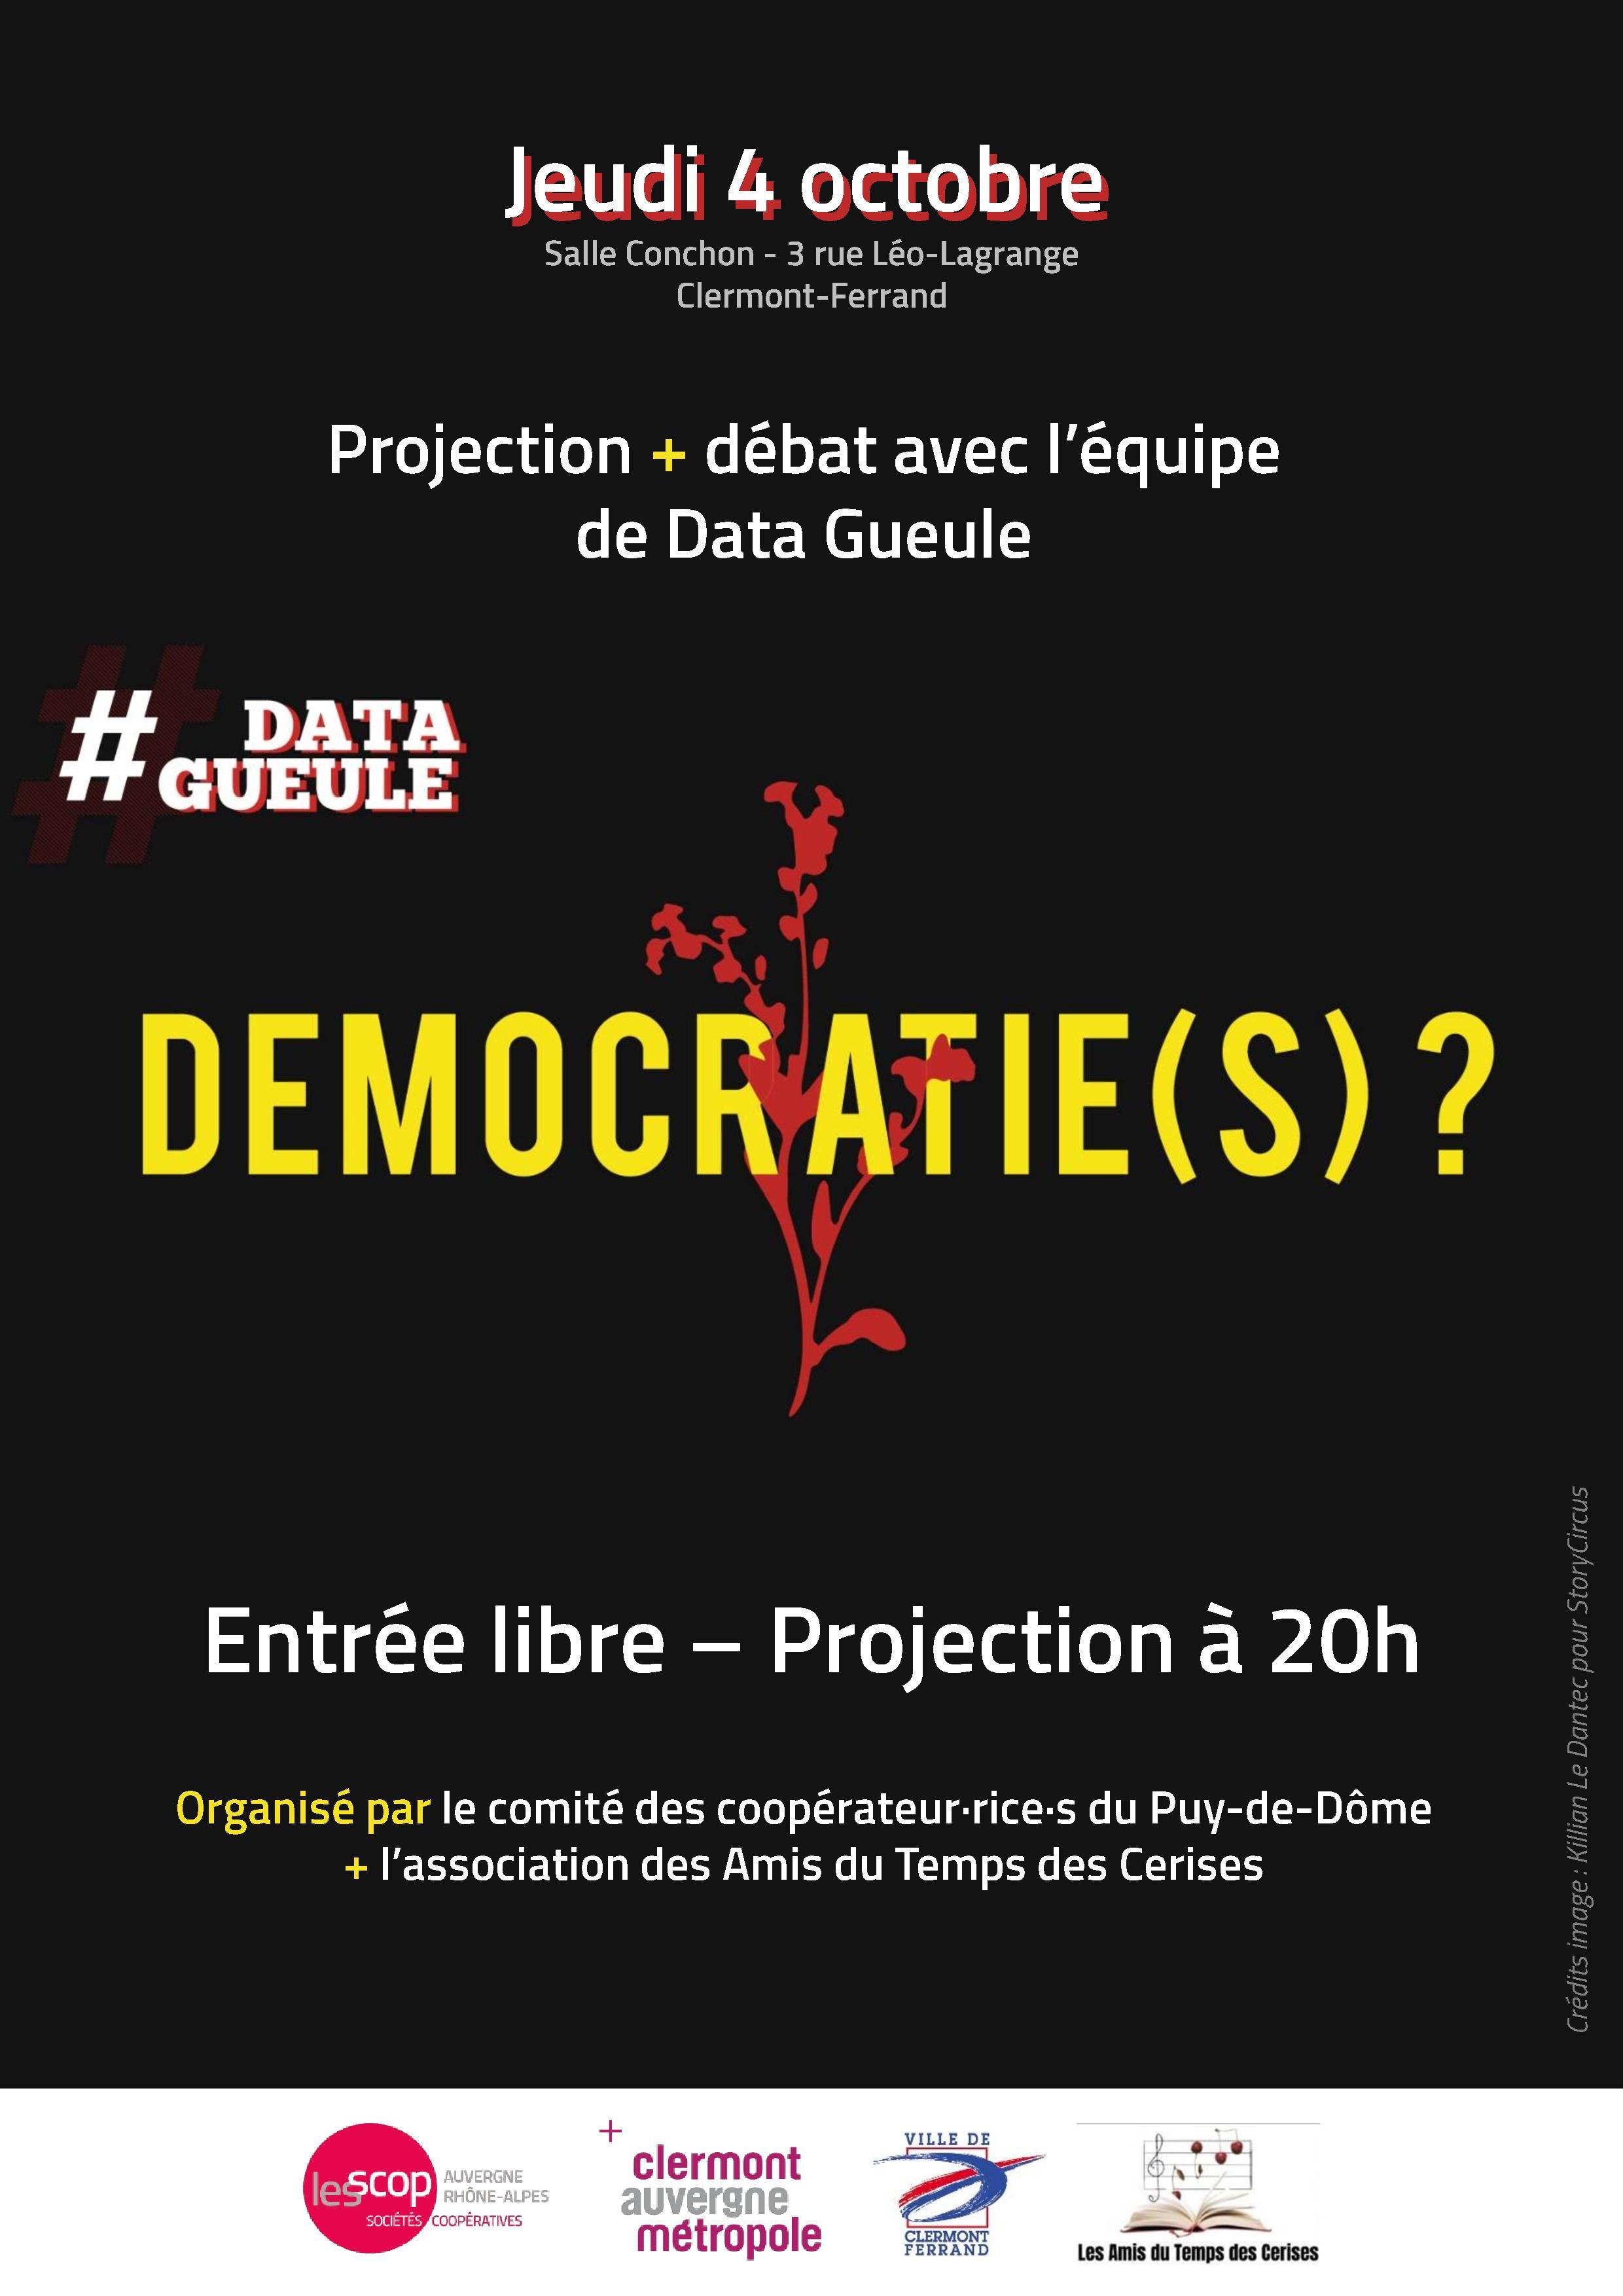 affiche_democraties_-_projection_jeudi_4_octobre_2018.jpg